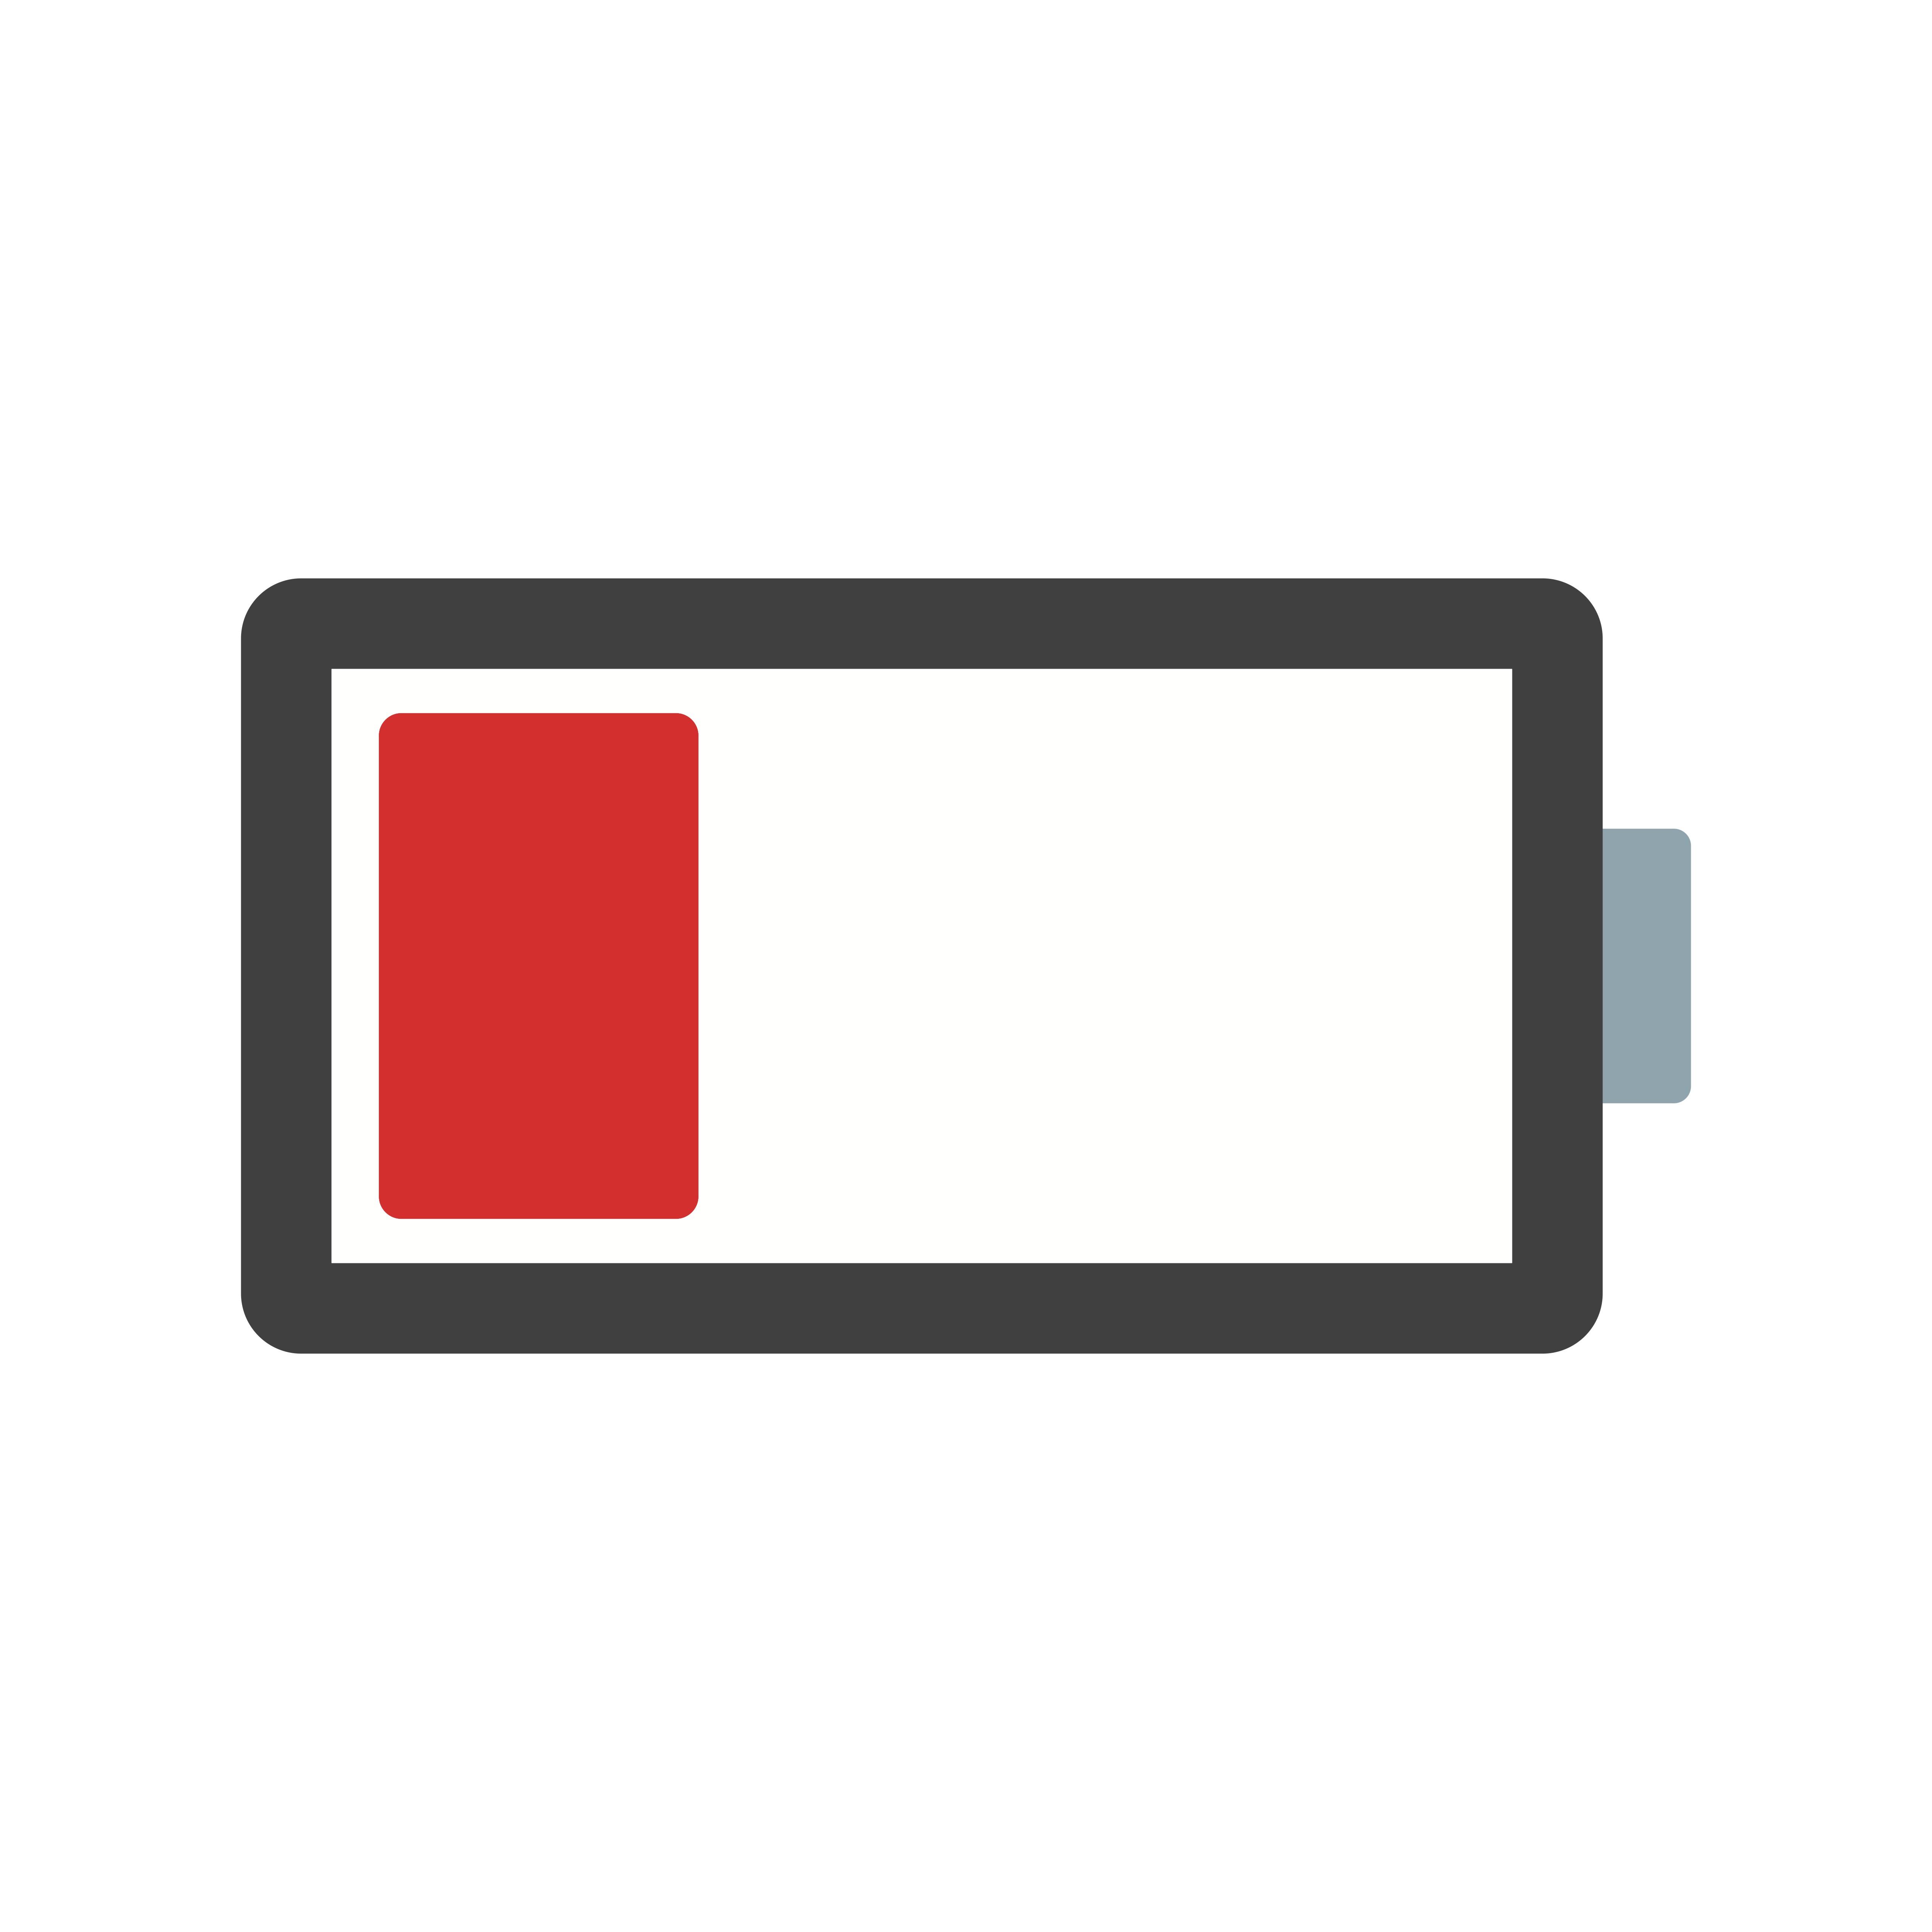 low battery vector icon download free vectors clipart graphics vector art low battery vector icon download free vectors clipart graphics vector art